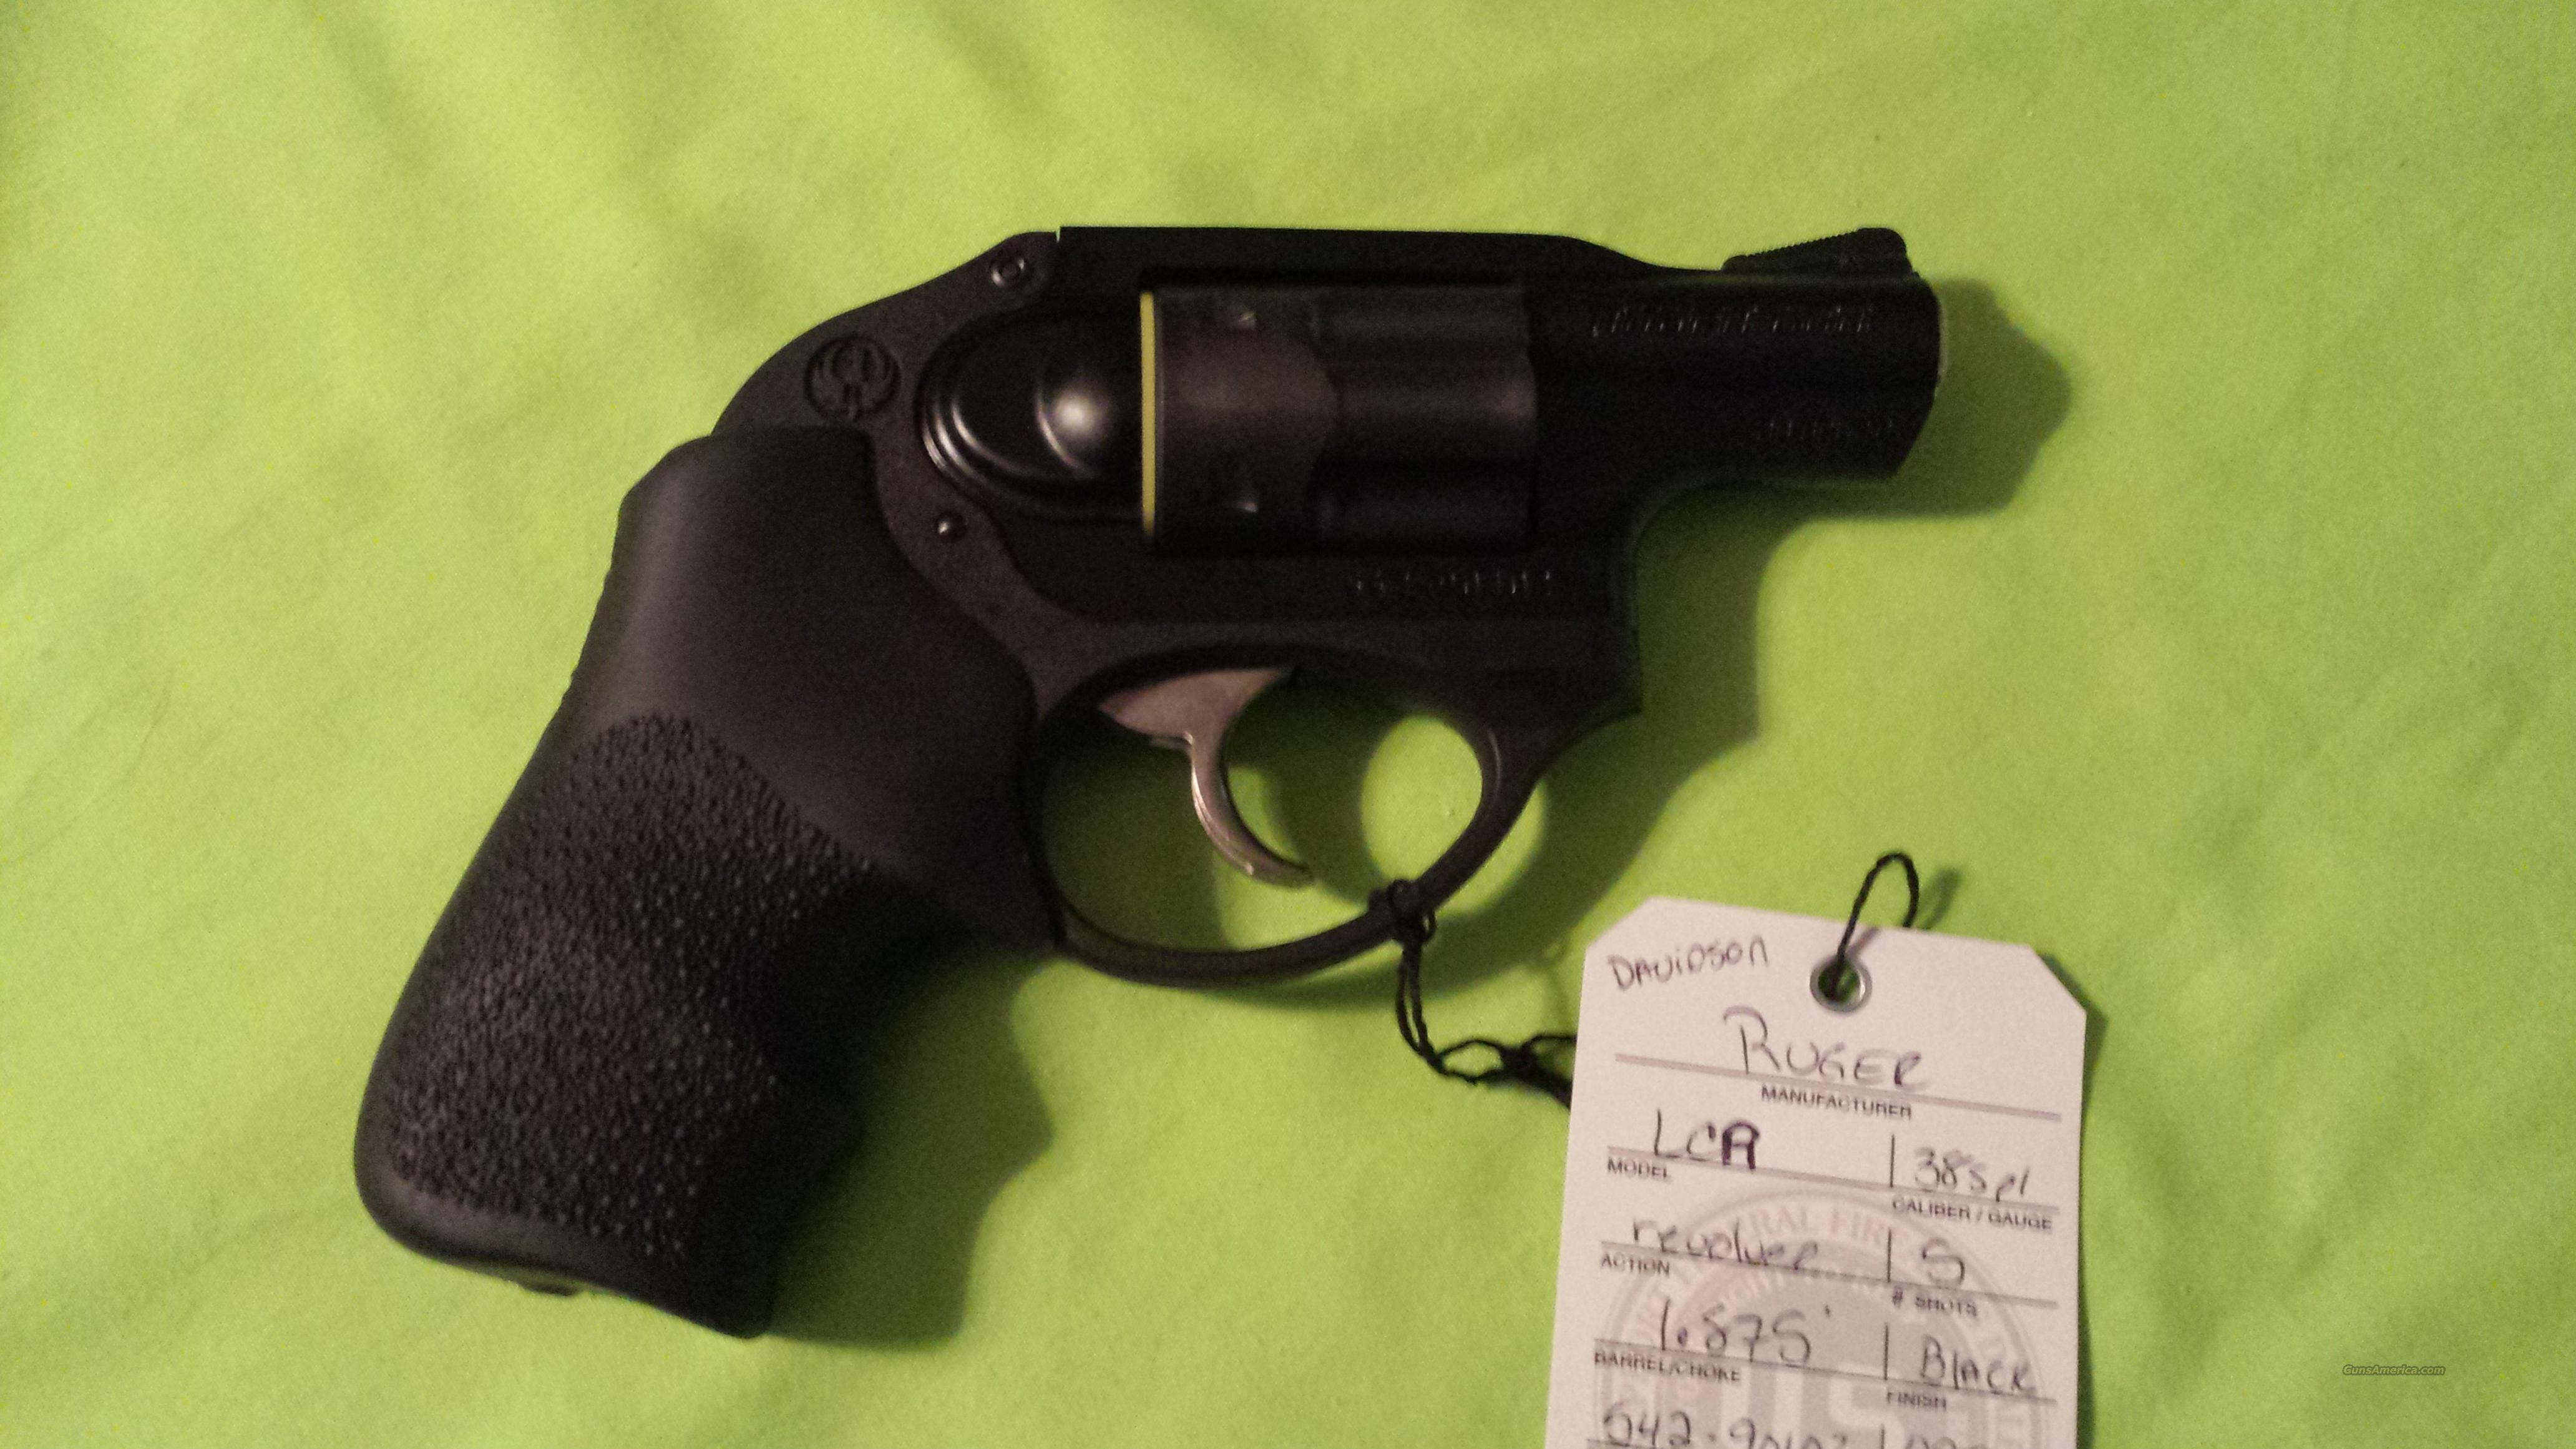 Ruger LCR Revolver .38SPL 38 SPL Special 5401  Guns > Pistols > Ruger Double Action Revolver > LCR